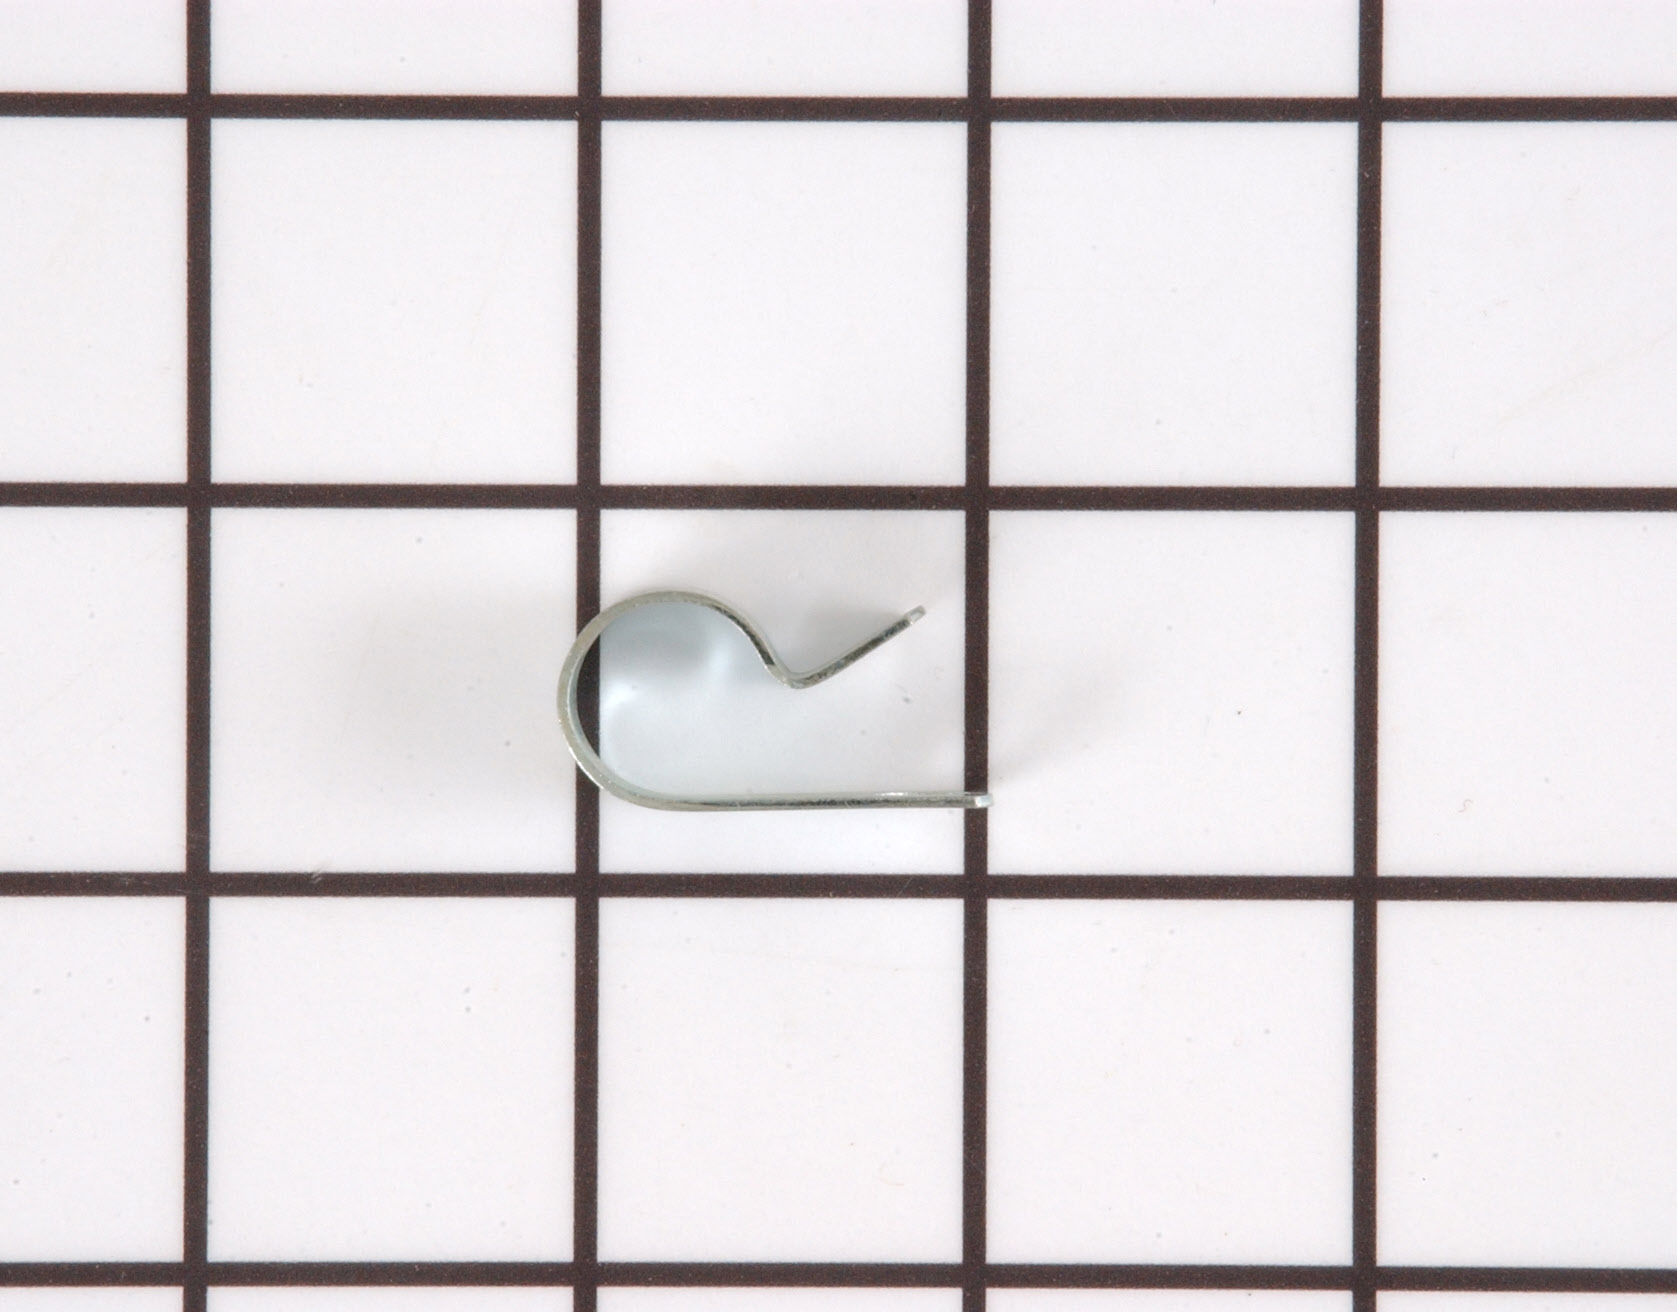 Whirlpool Refrigerator Part # WP308605 - Strain Relief